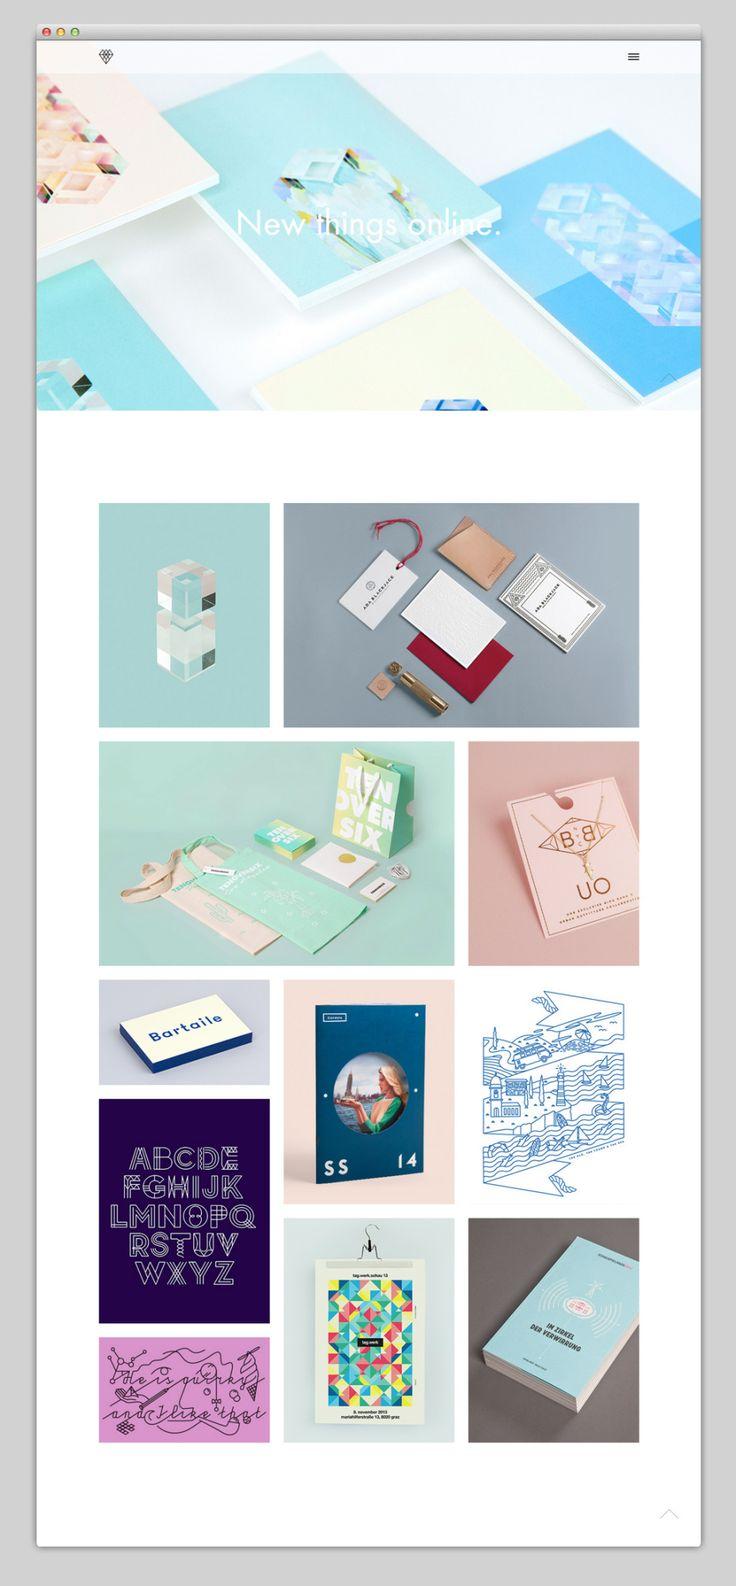 Verena Michelitsch Website Landing Page Design | Minimal grid based website design